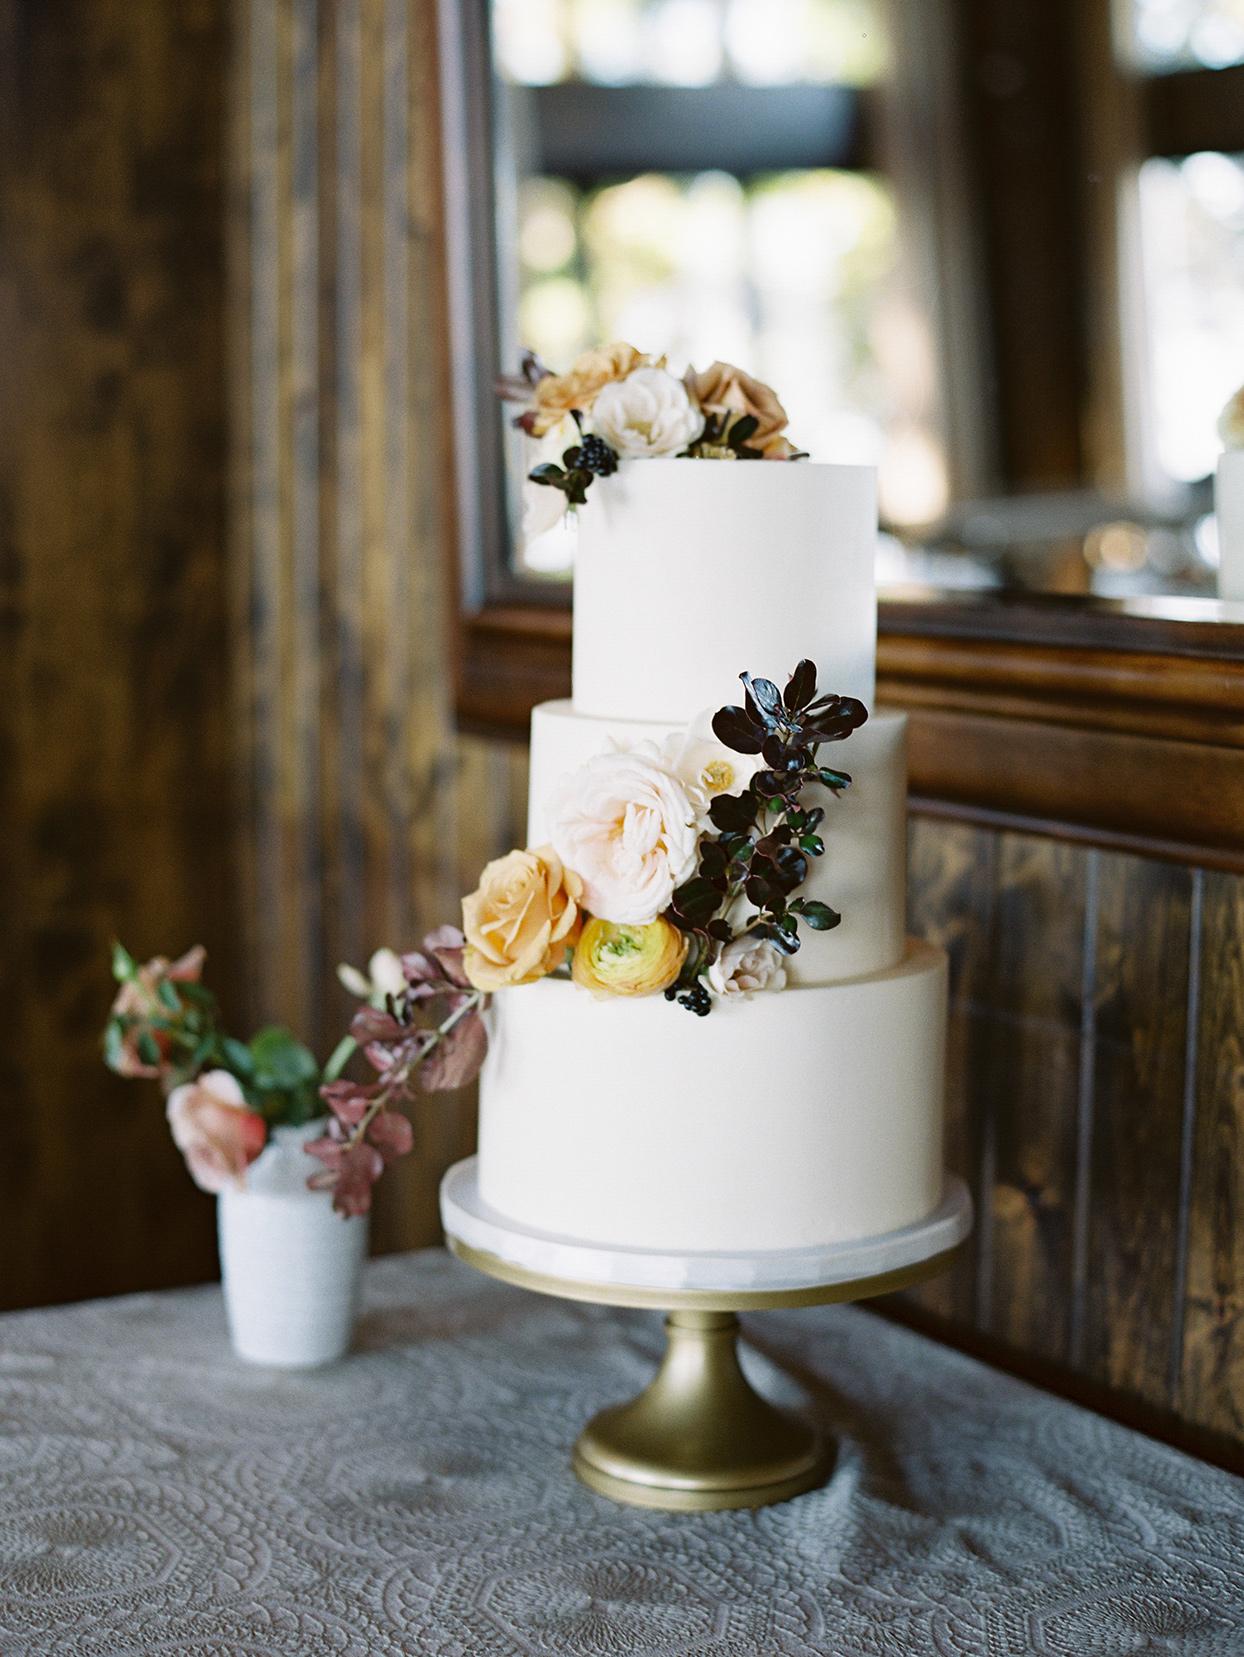 alexandra david wedding three tiered wedding cake with flowers